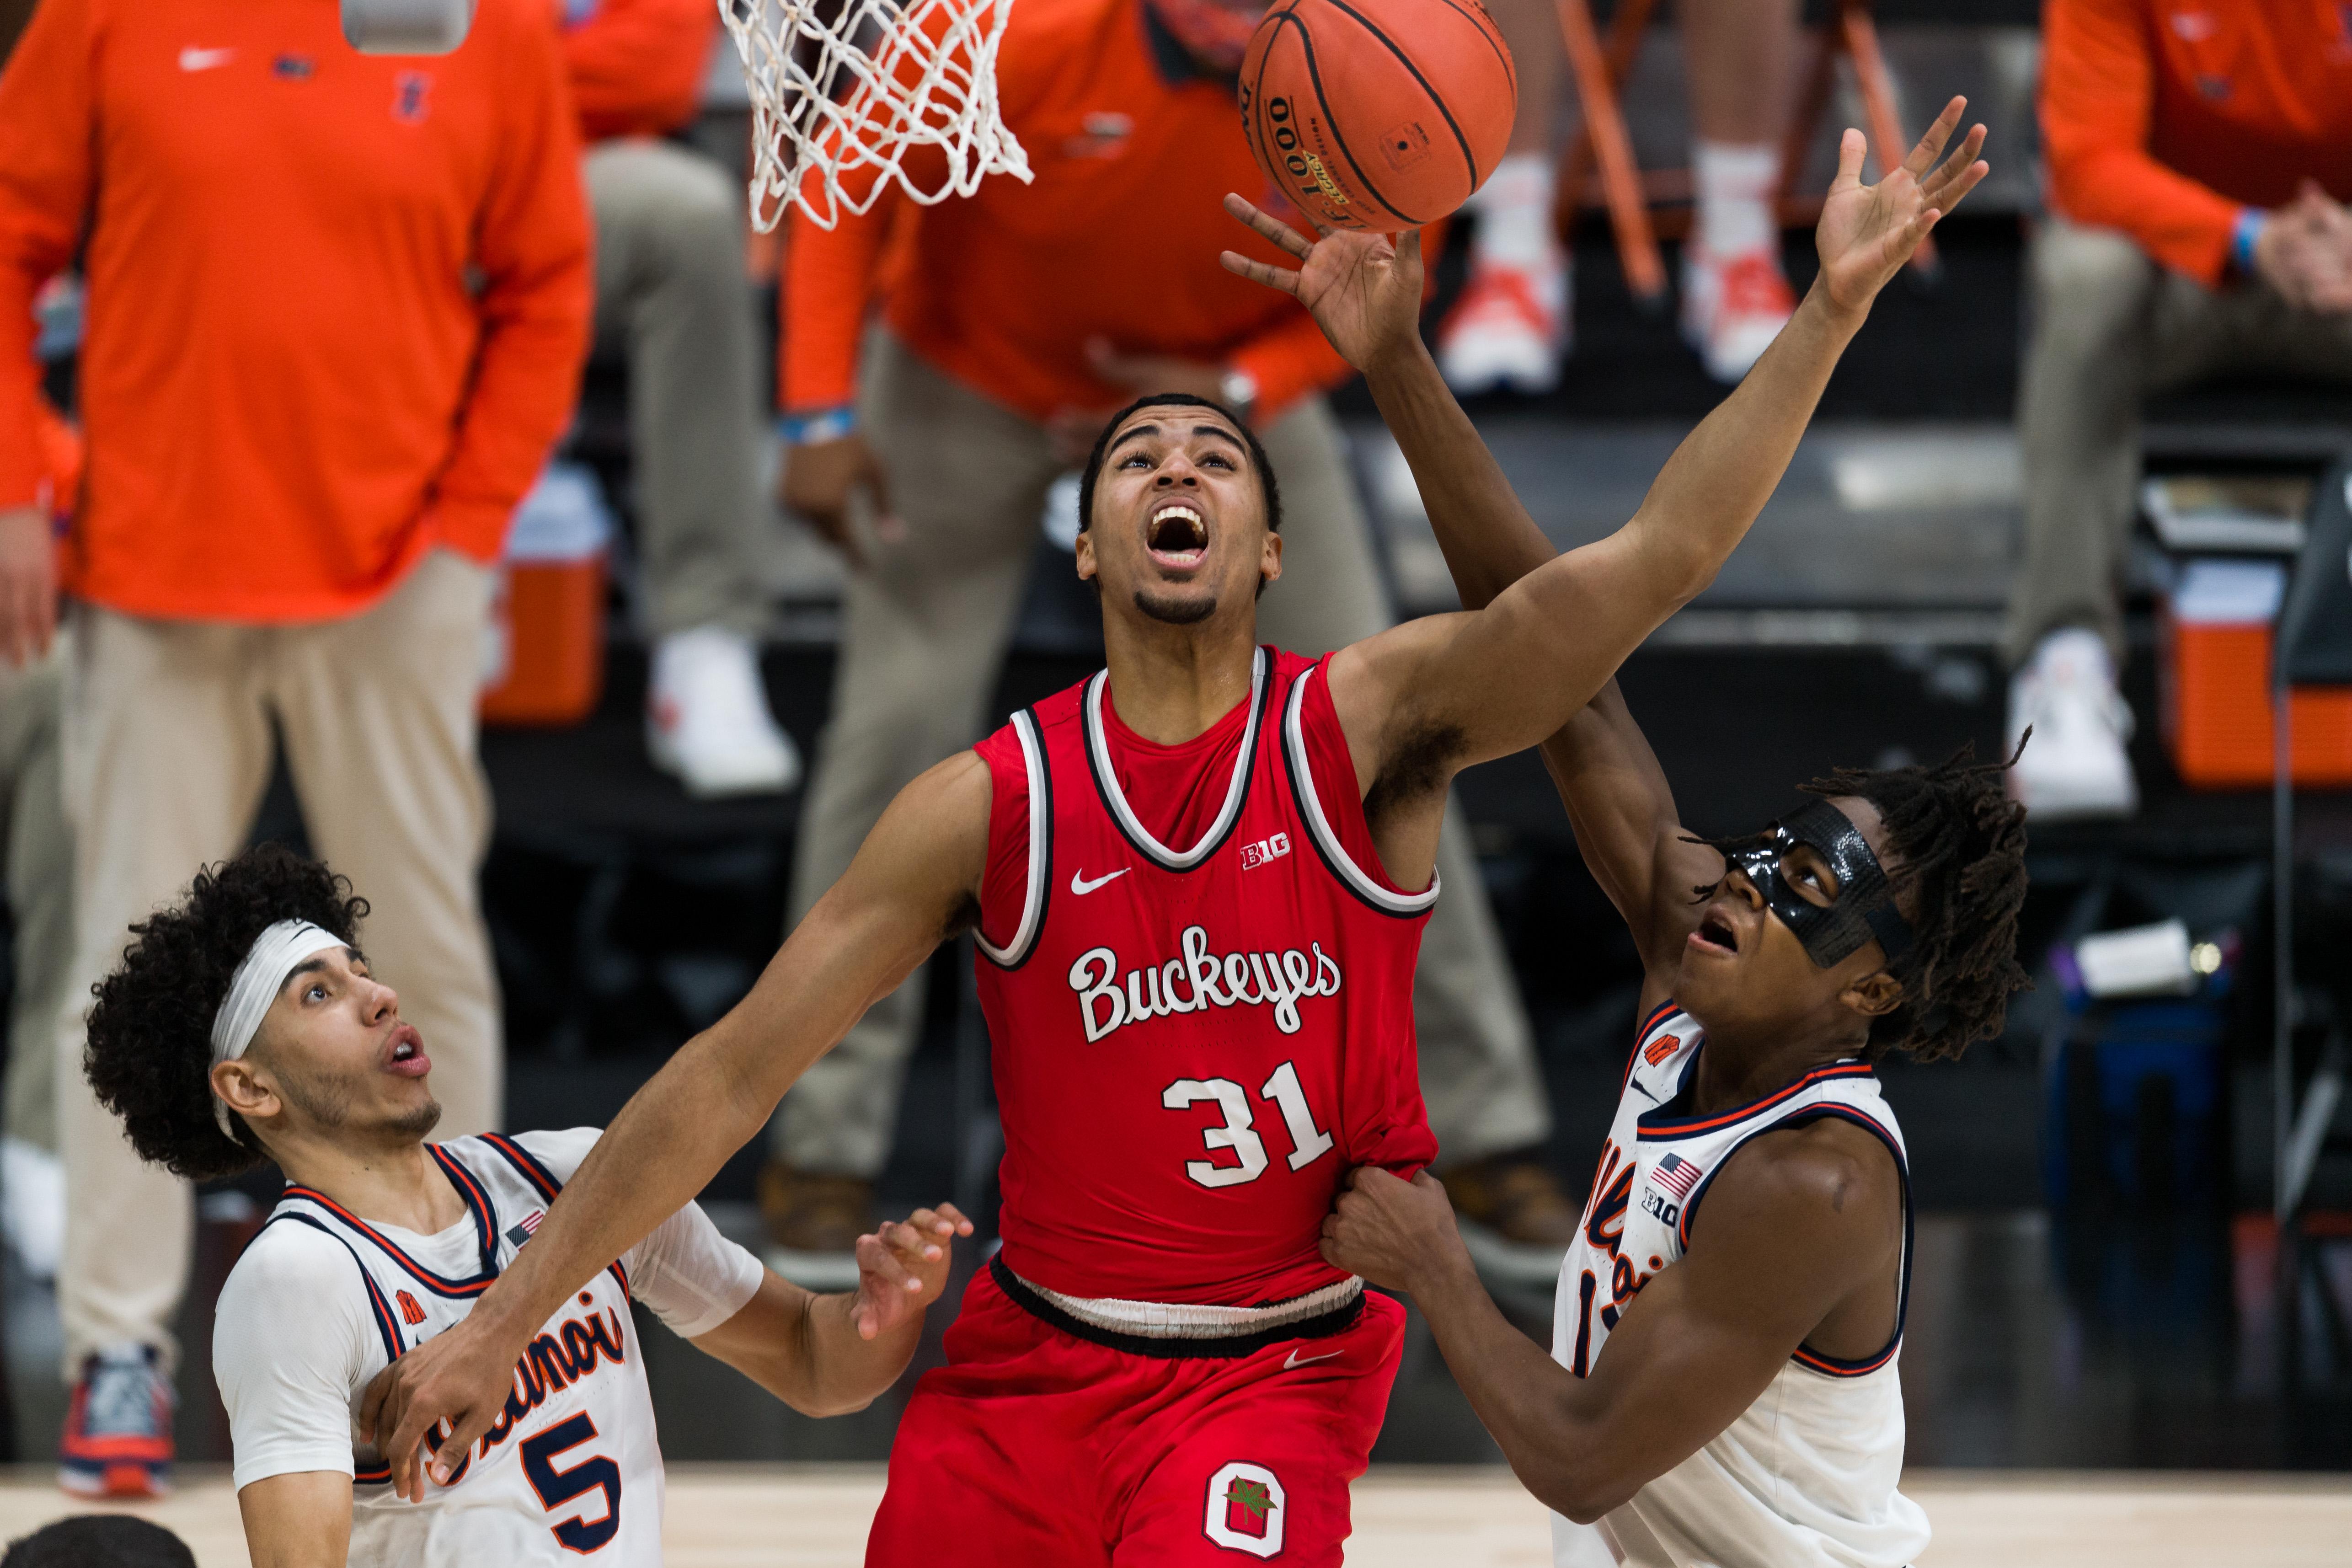 COLLEGE BASKETBALL: MAR 14 Big Ten Tournament - Ohio State v Illinois